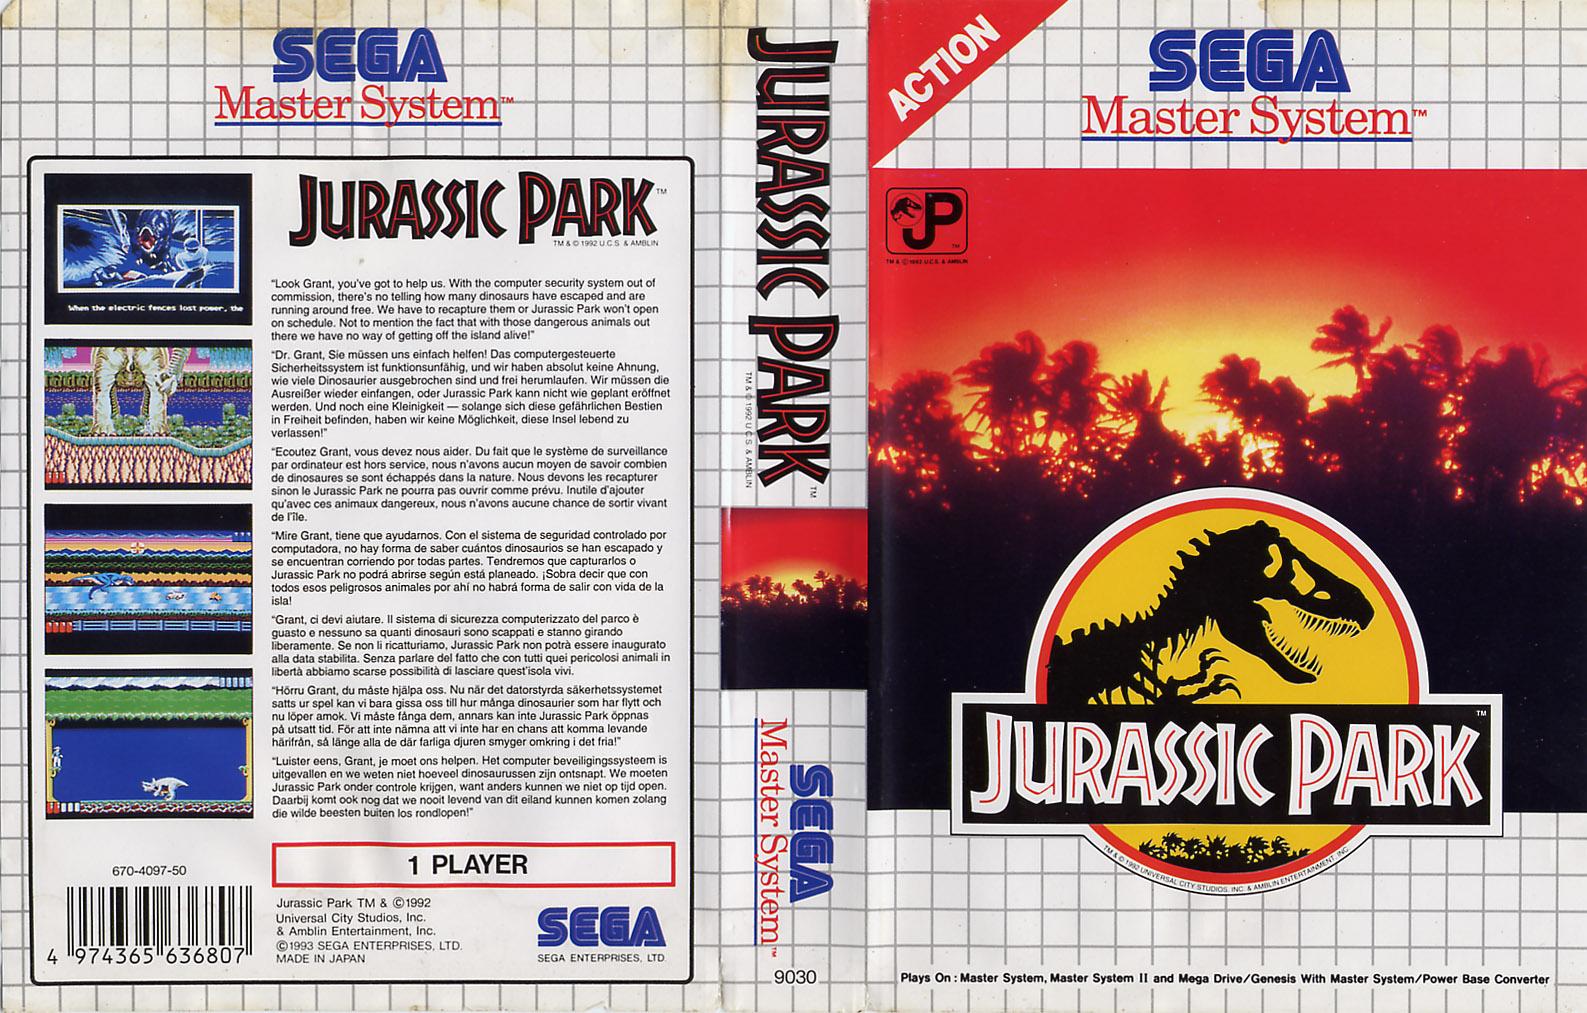 http://www.smspower.org/uploads/Scans/JurassicPark-SMS-EU.jpg